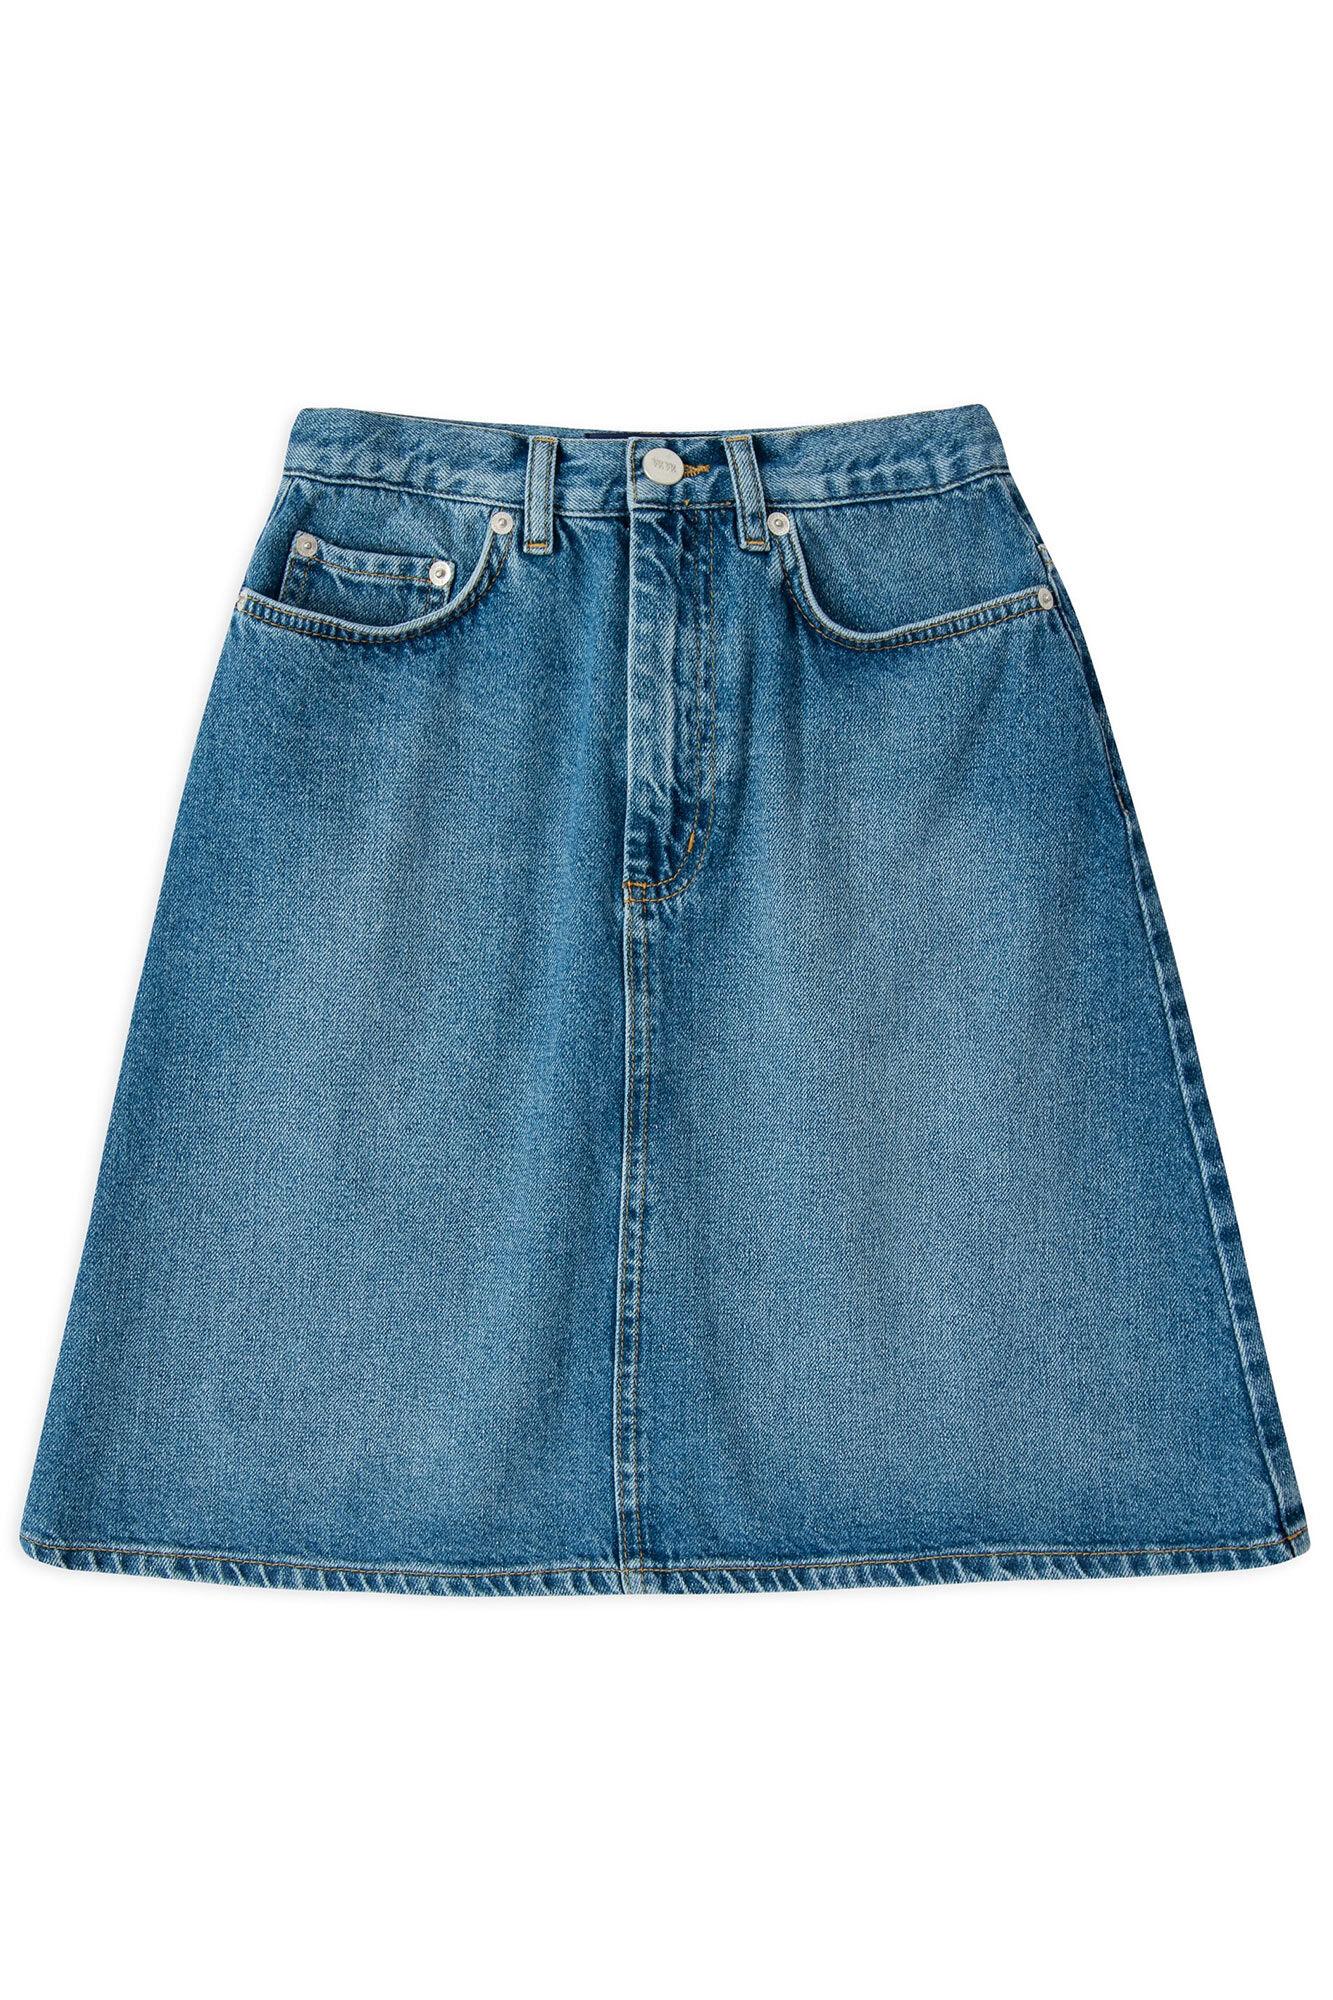 Ynes skirt 11911905-7006, CLASSIC BLUE VINTAGE